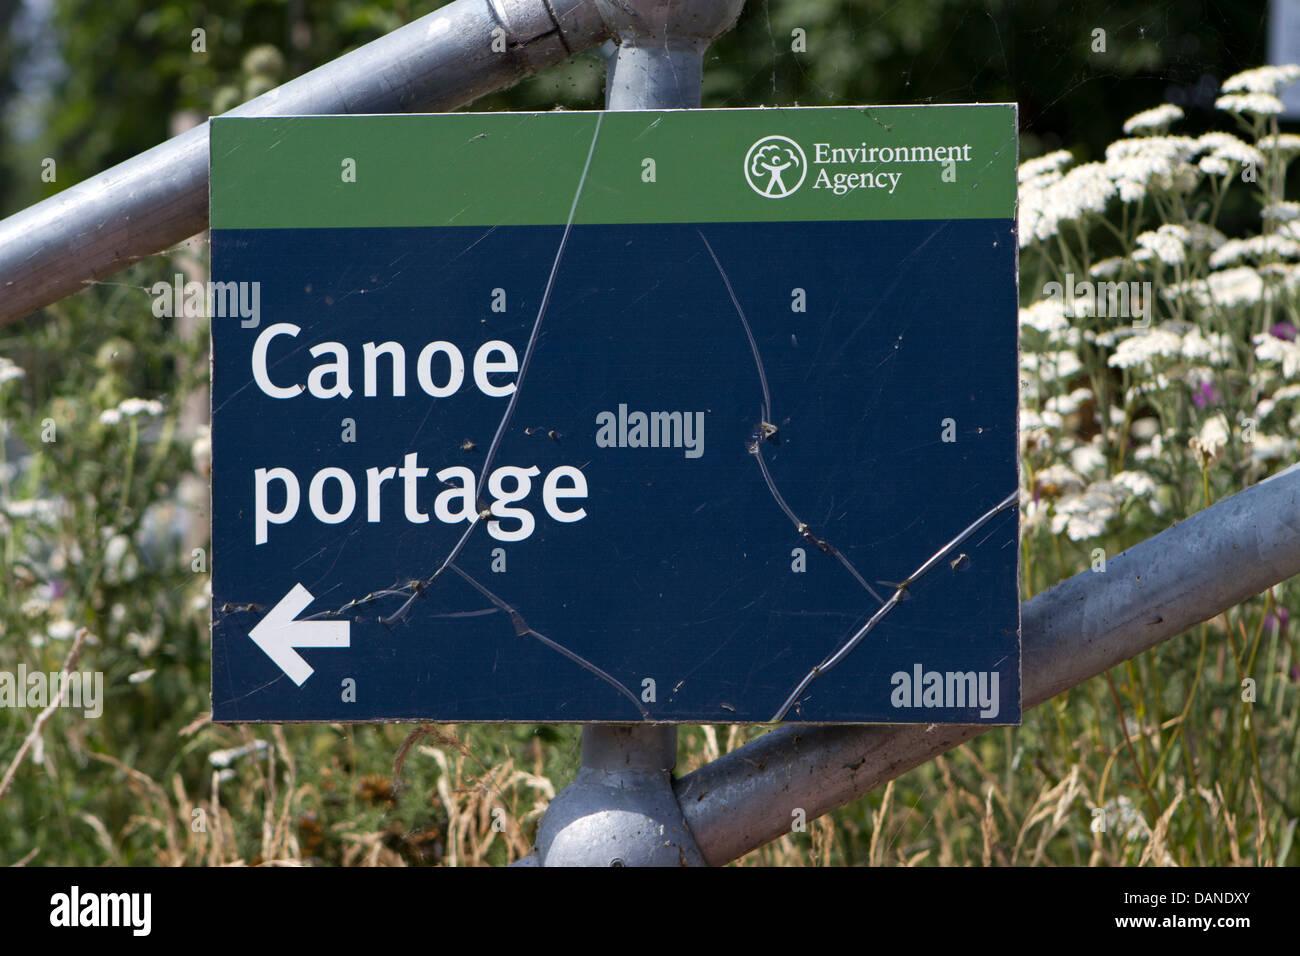 Canoe portage sign at Chertsey Lock, Surrey. - Stock Image